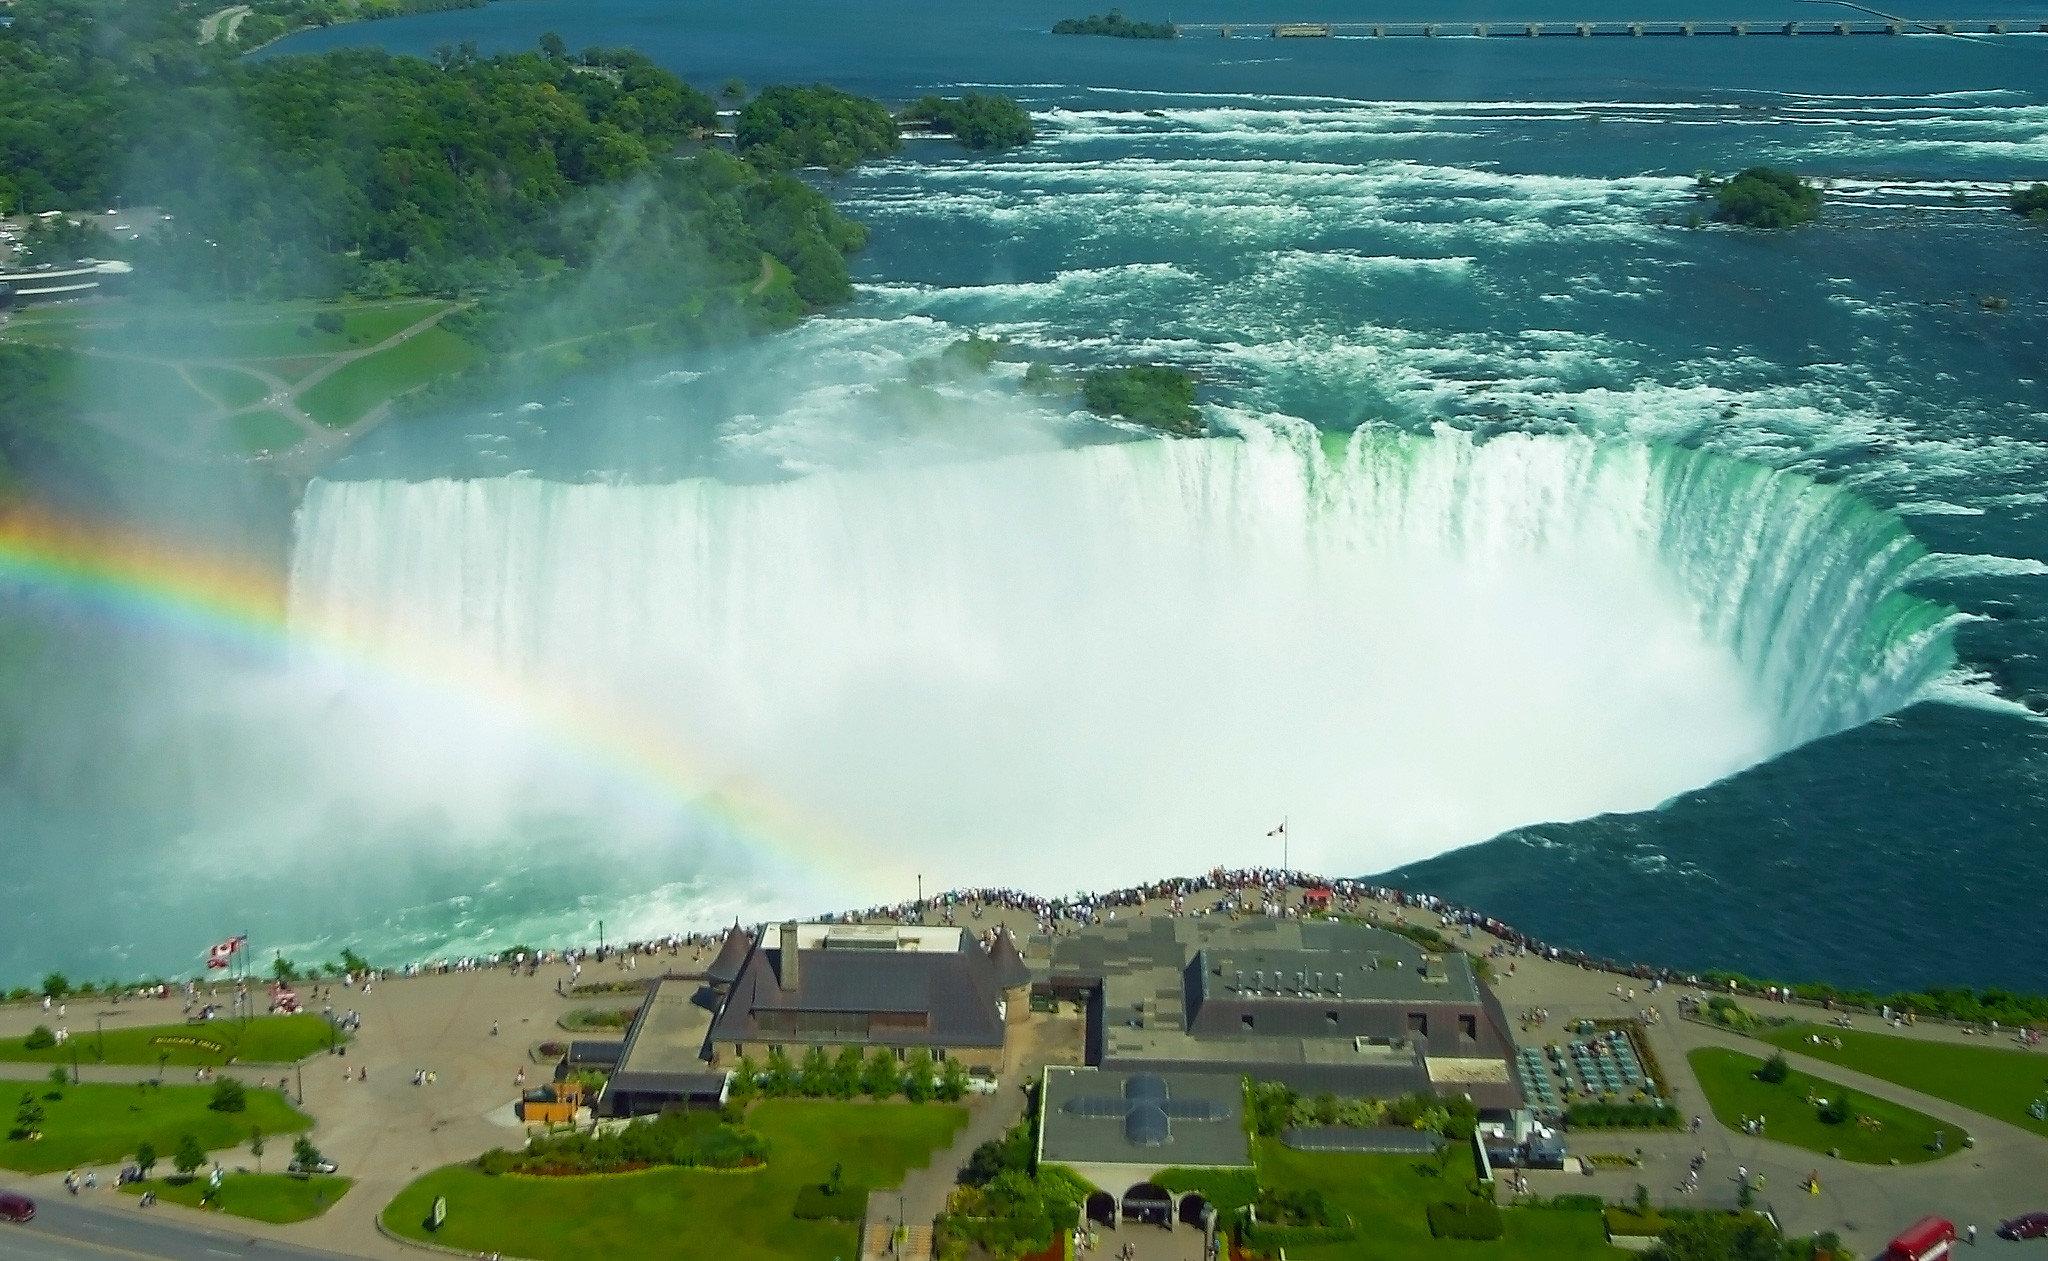 Honeymoon Natural wonders Romance Scenic views Waterfront water rainbow atmosphere of earth water feature Sea Coast